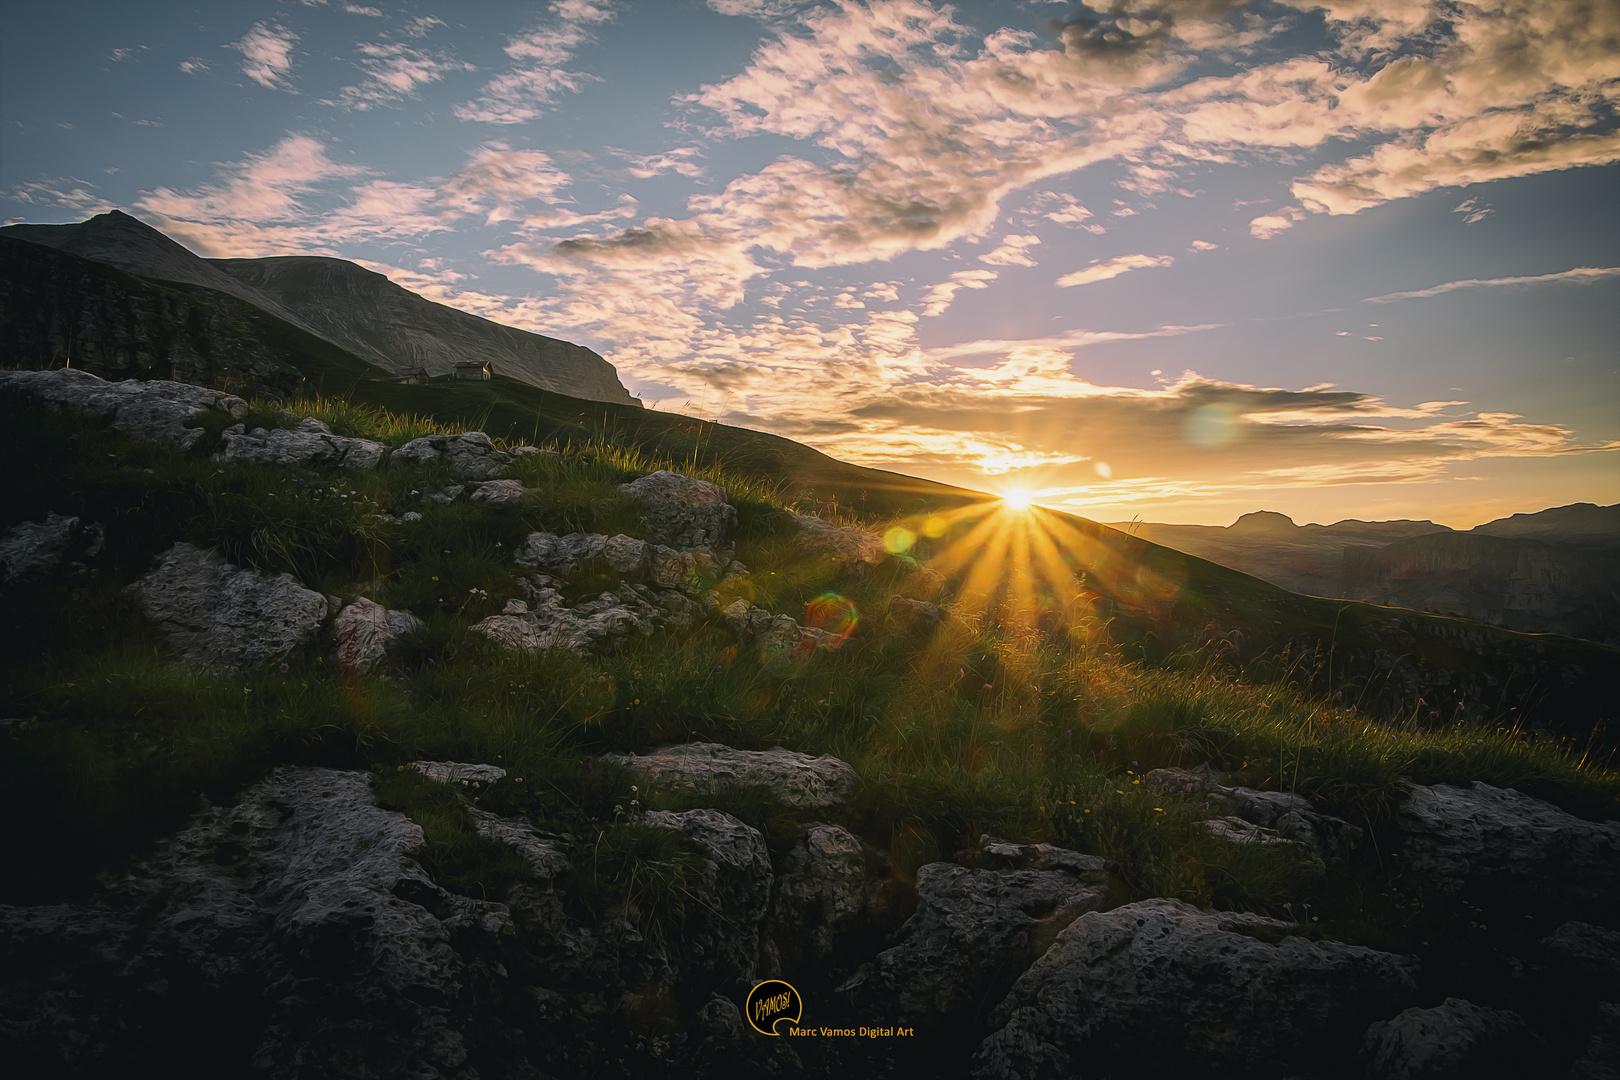 Sonnenaufgang unterhalb der Stevia-Hütte